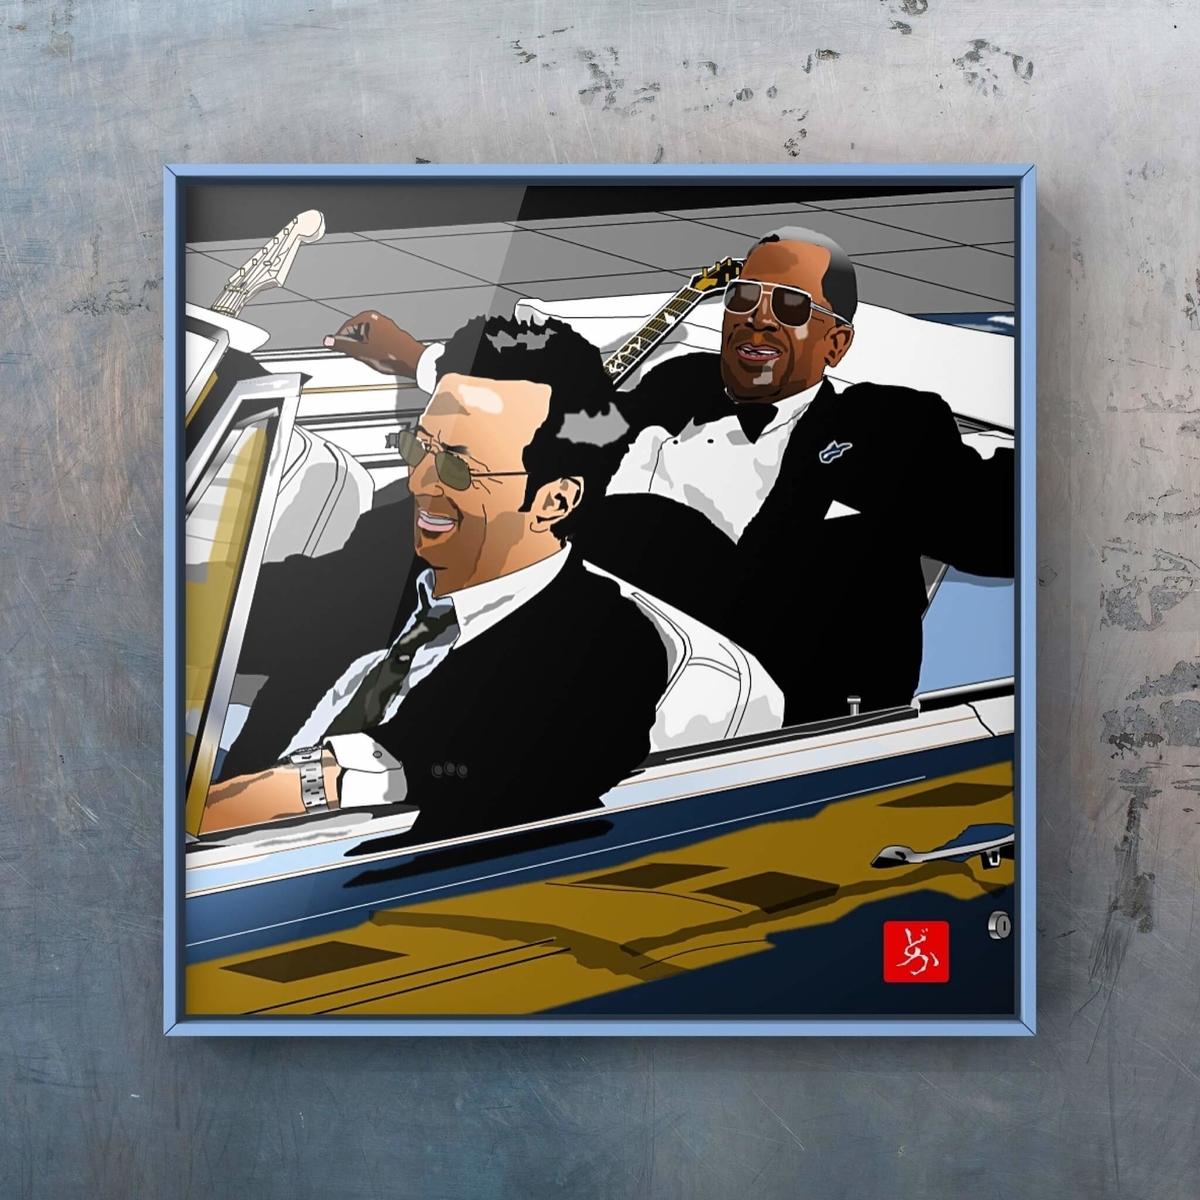 B.B.キング&エリック・クラプトン「ライディング・ウィズ・ザ・キング」のエクセル画イラスト額装版